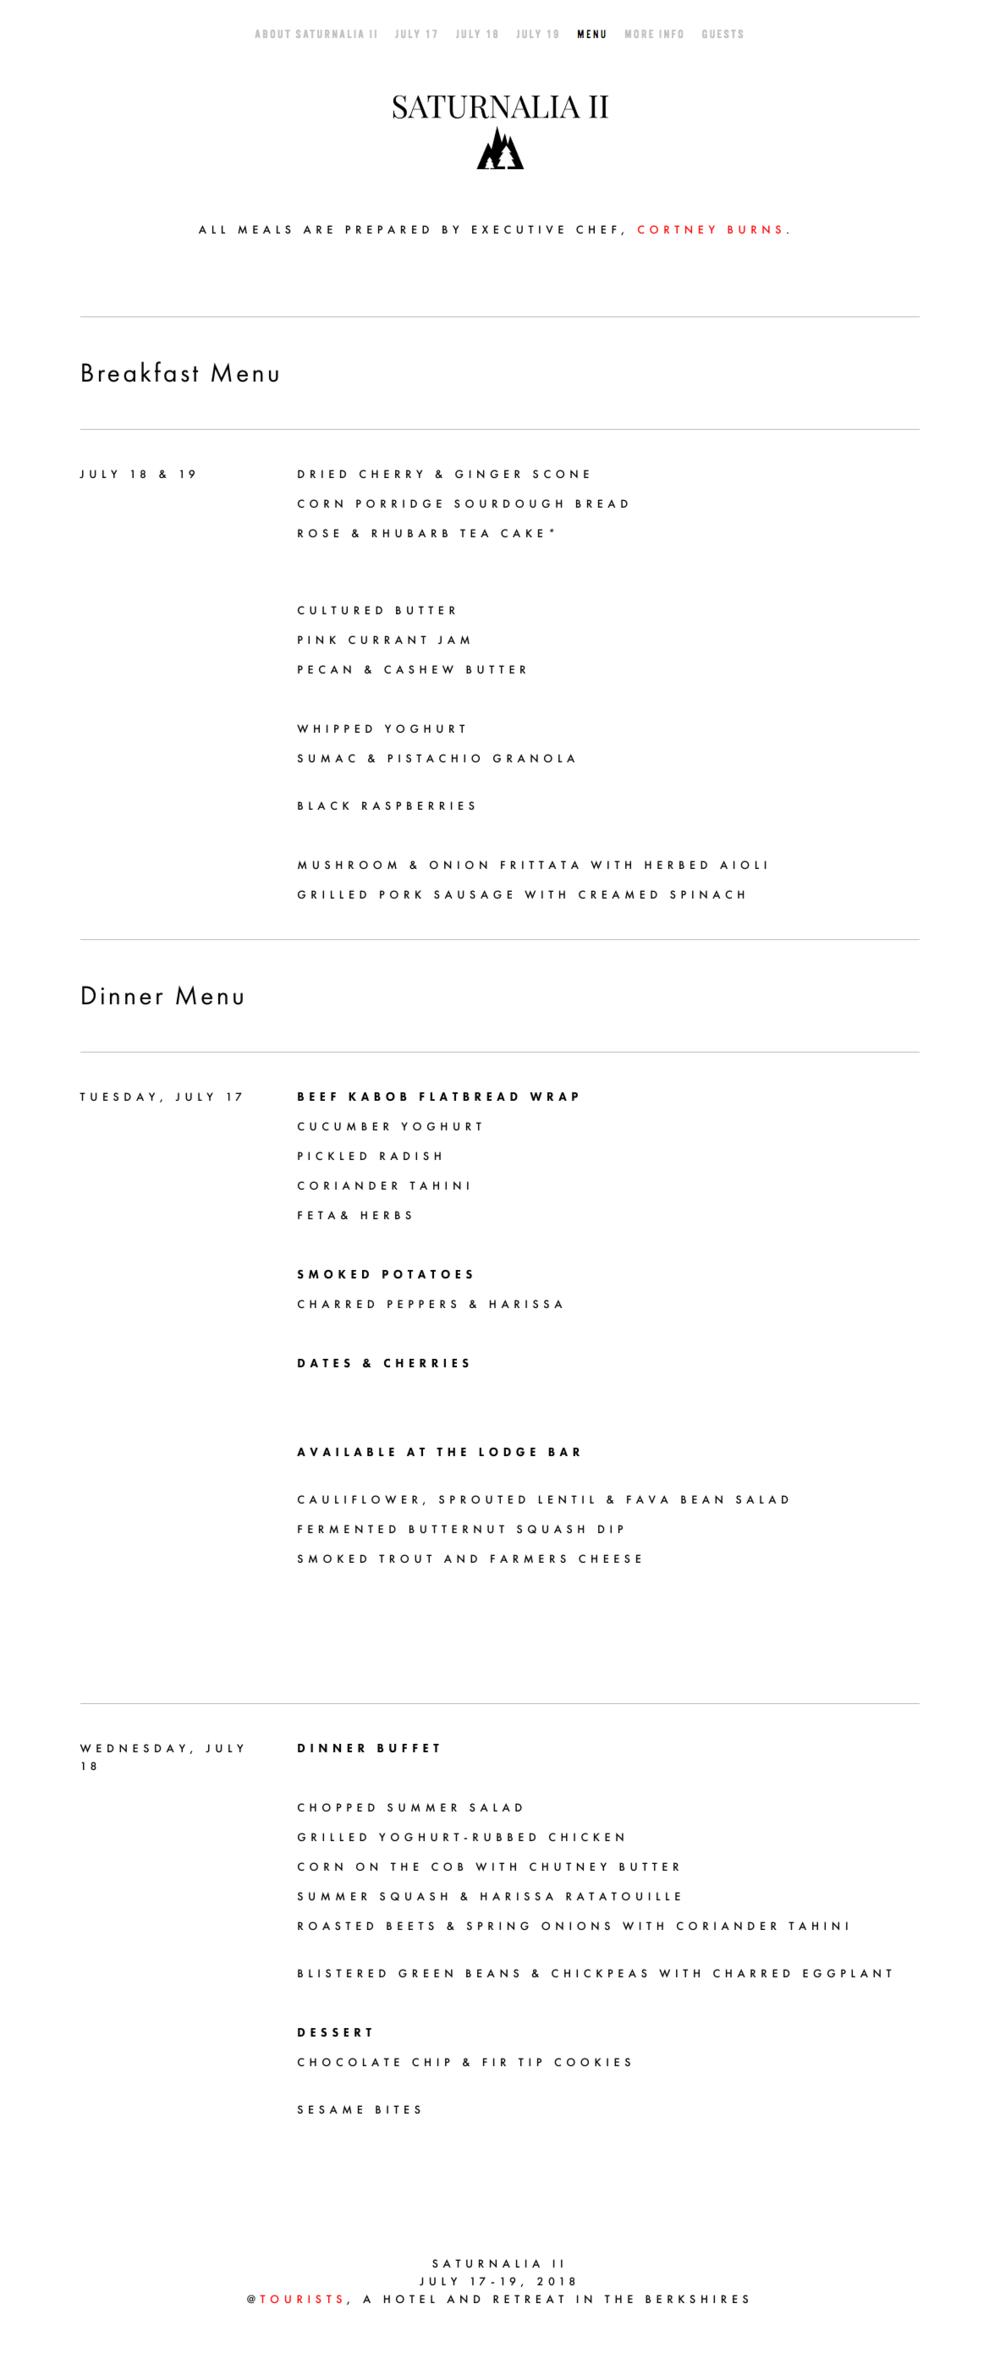 saturnalia-menu-page.png